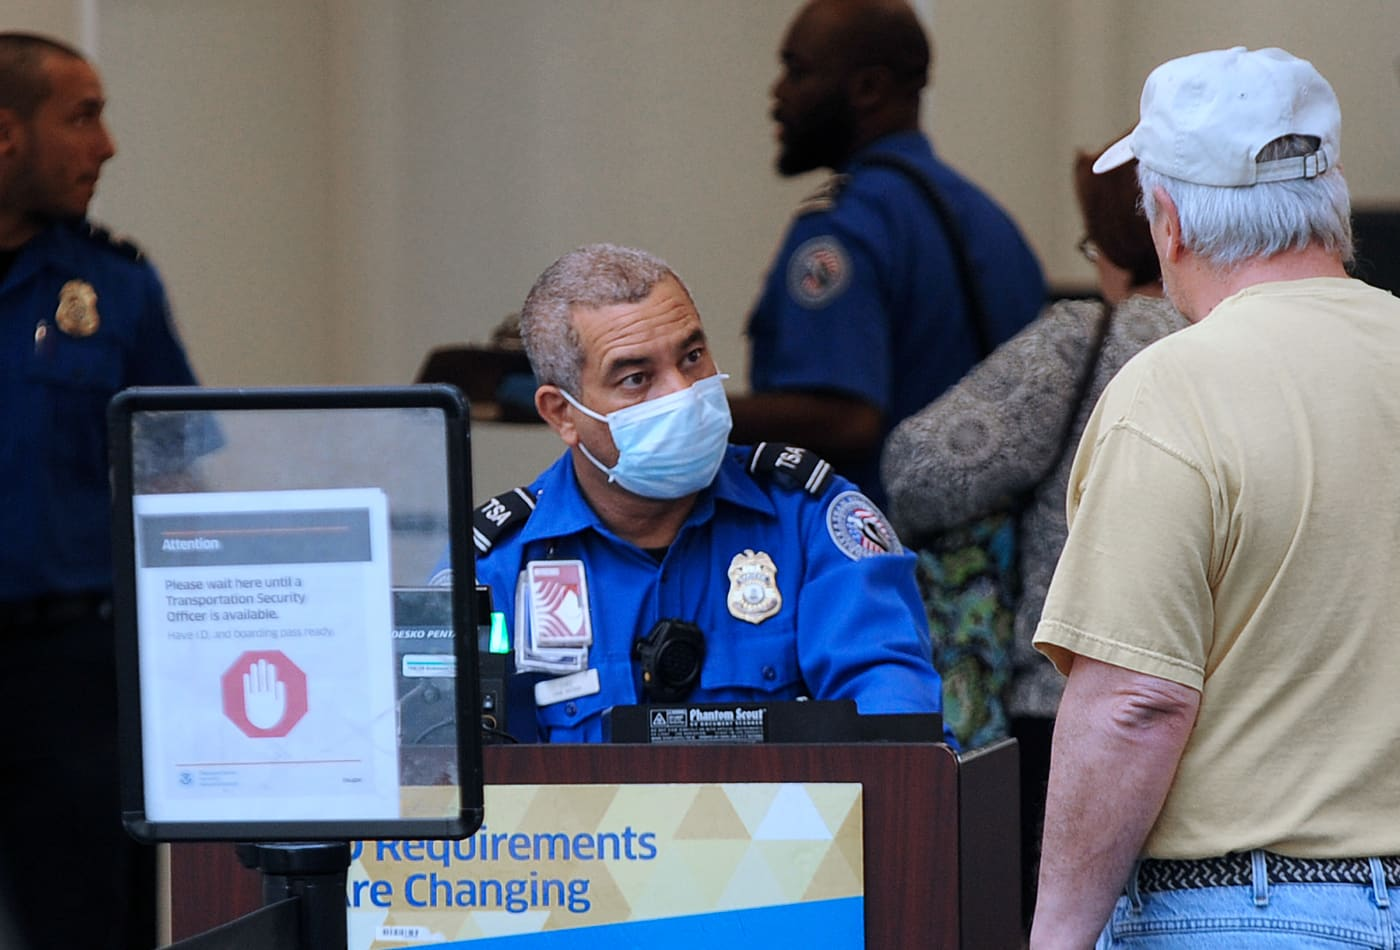 Hold onto your boarding pass. How TSA screening procedures are changing because of coronavirus